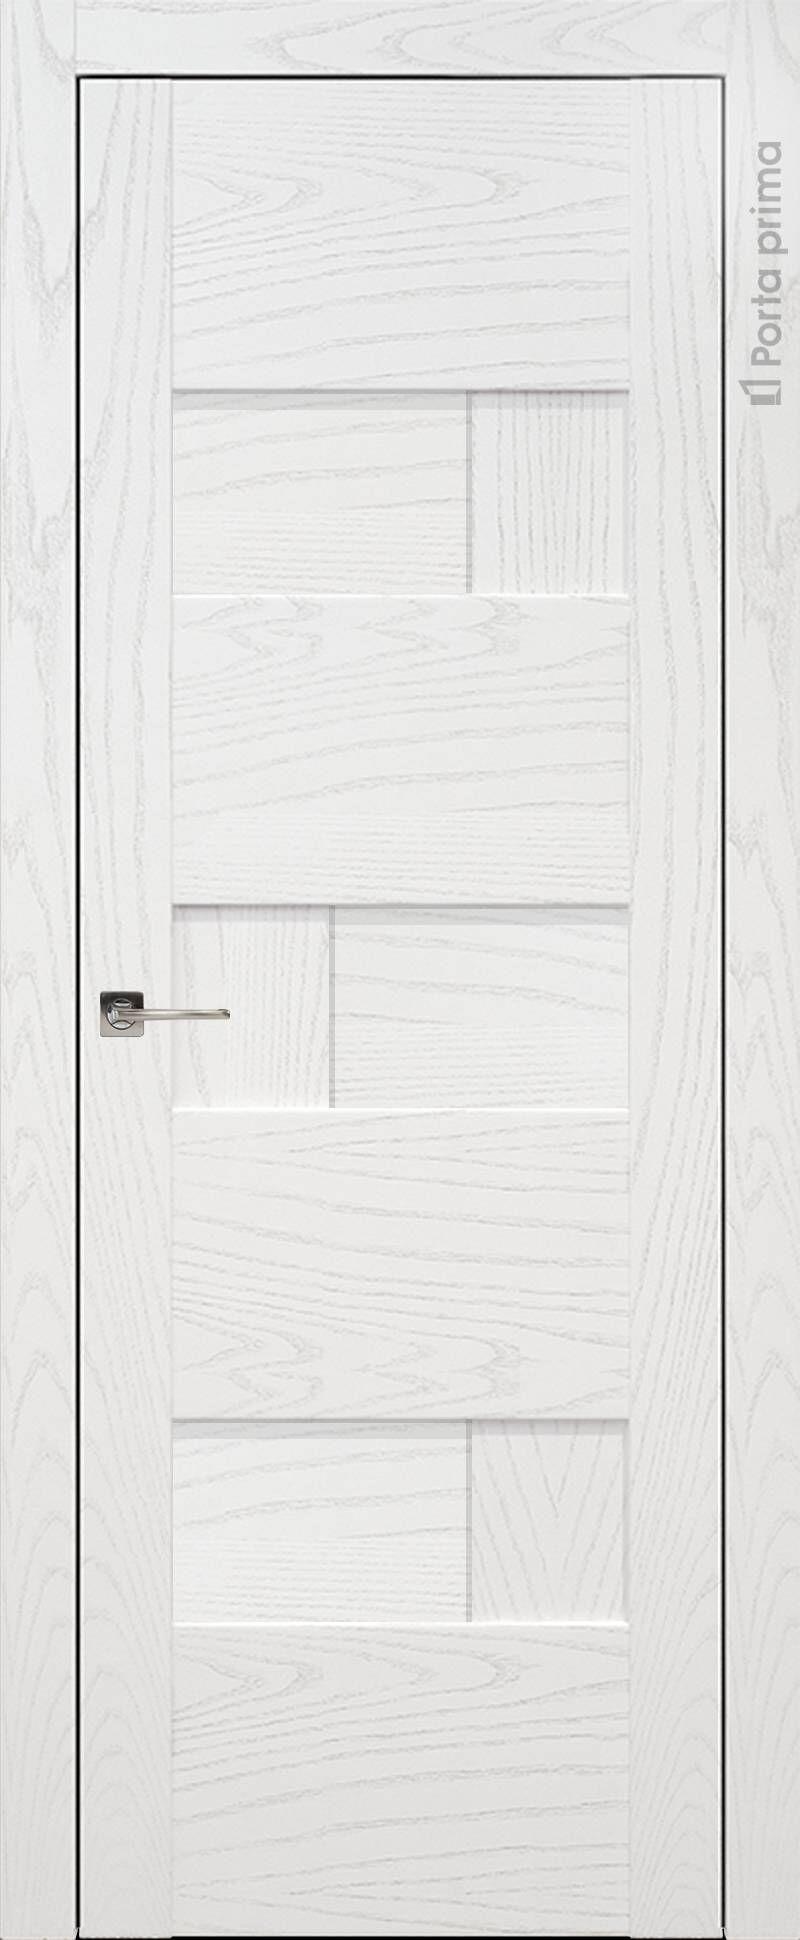 Vicenza цвет - Белый ясень (шпон) Без стекла (ДГ)